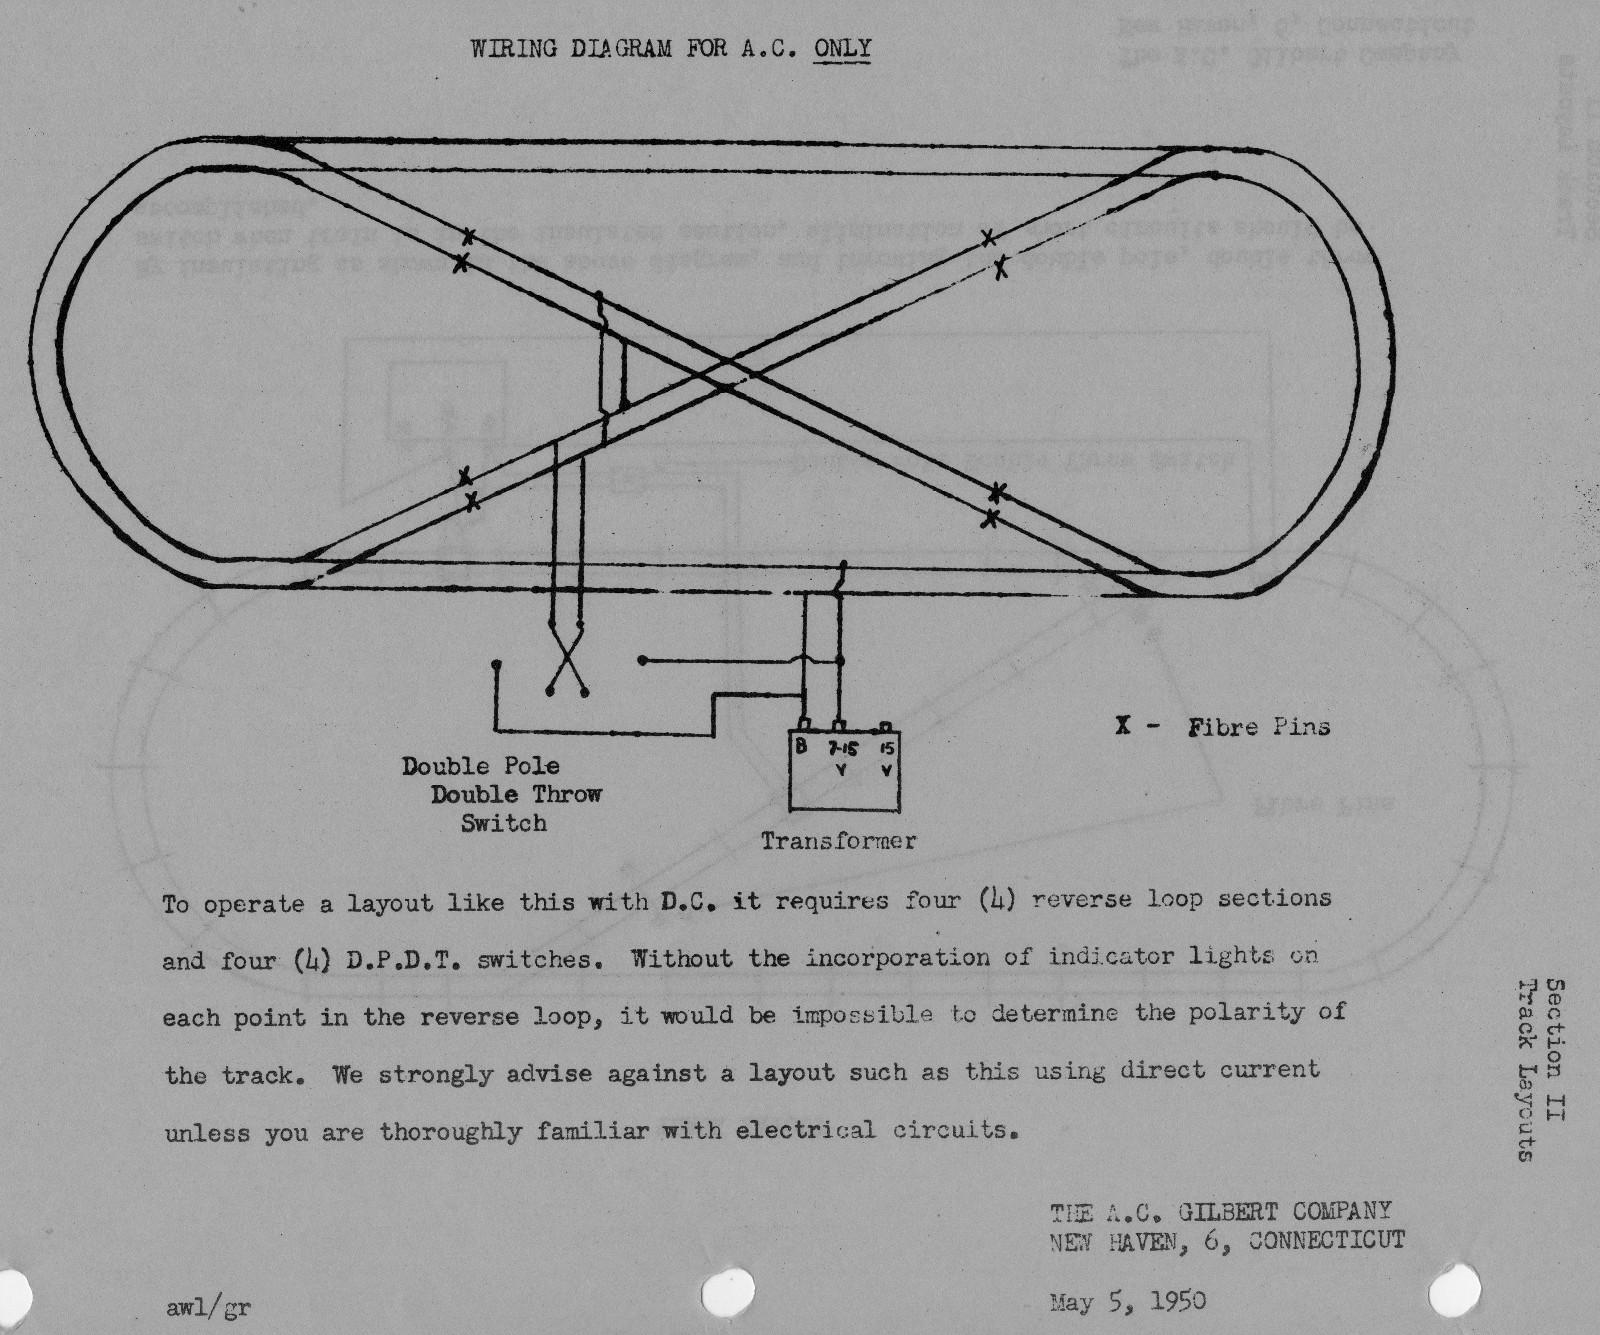 light wiring diagram loop trane xe1000 american flyer reverse layout traindr